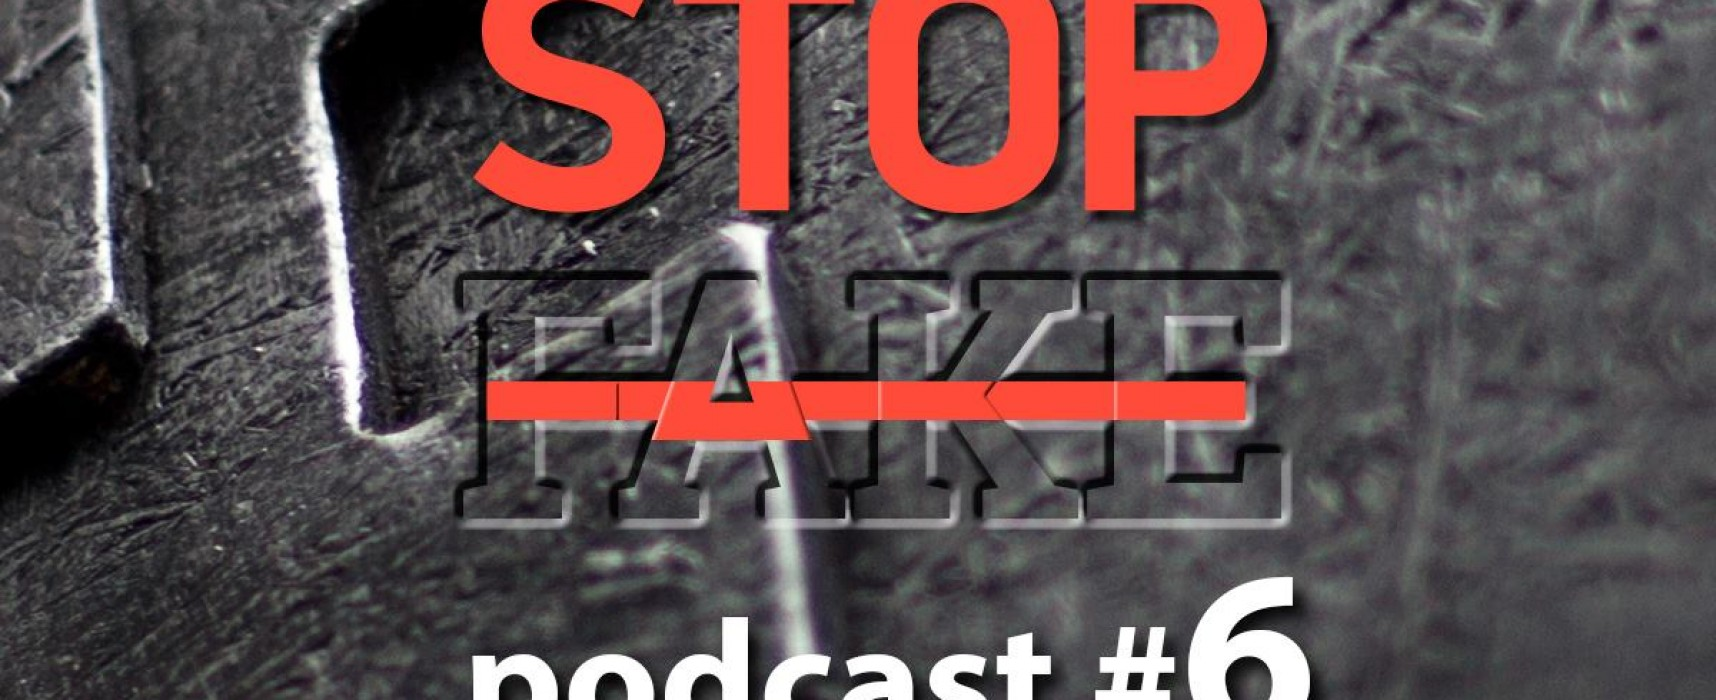 StopFake podcast #6